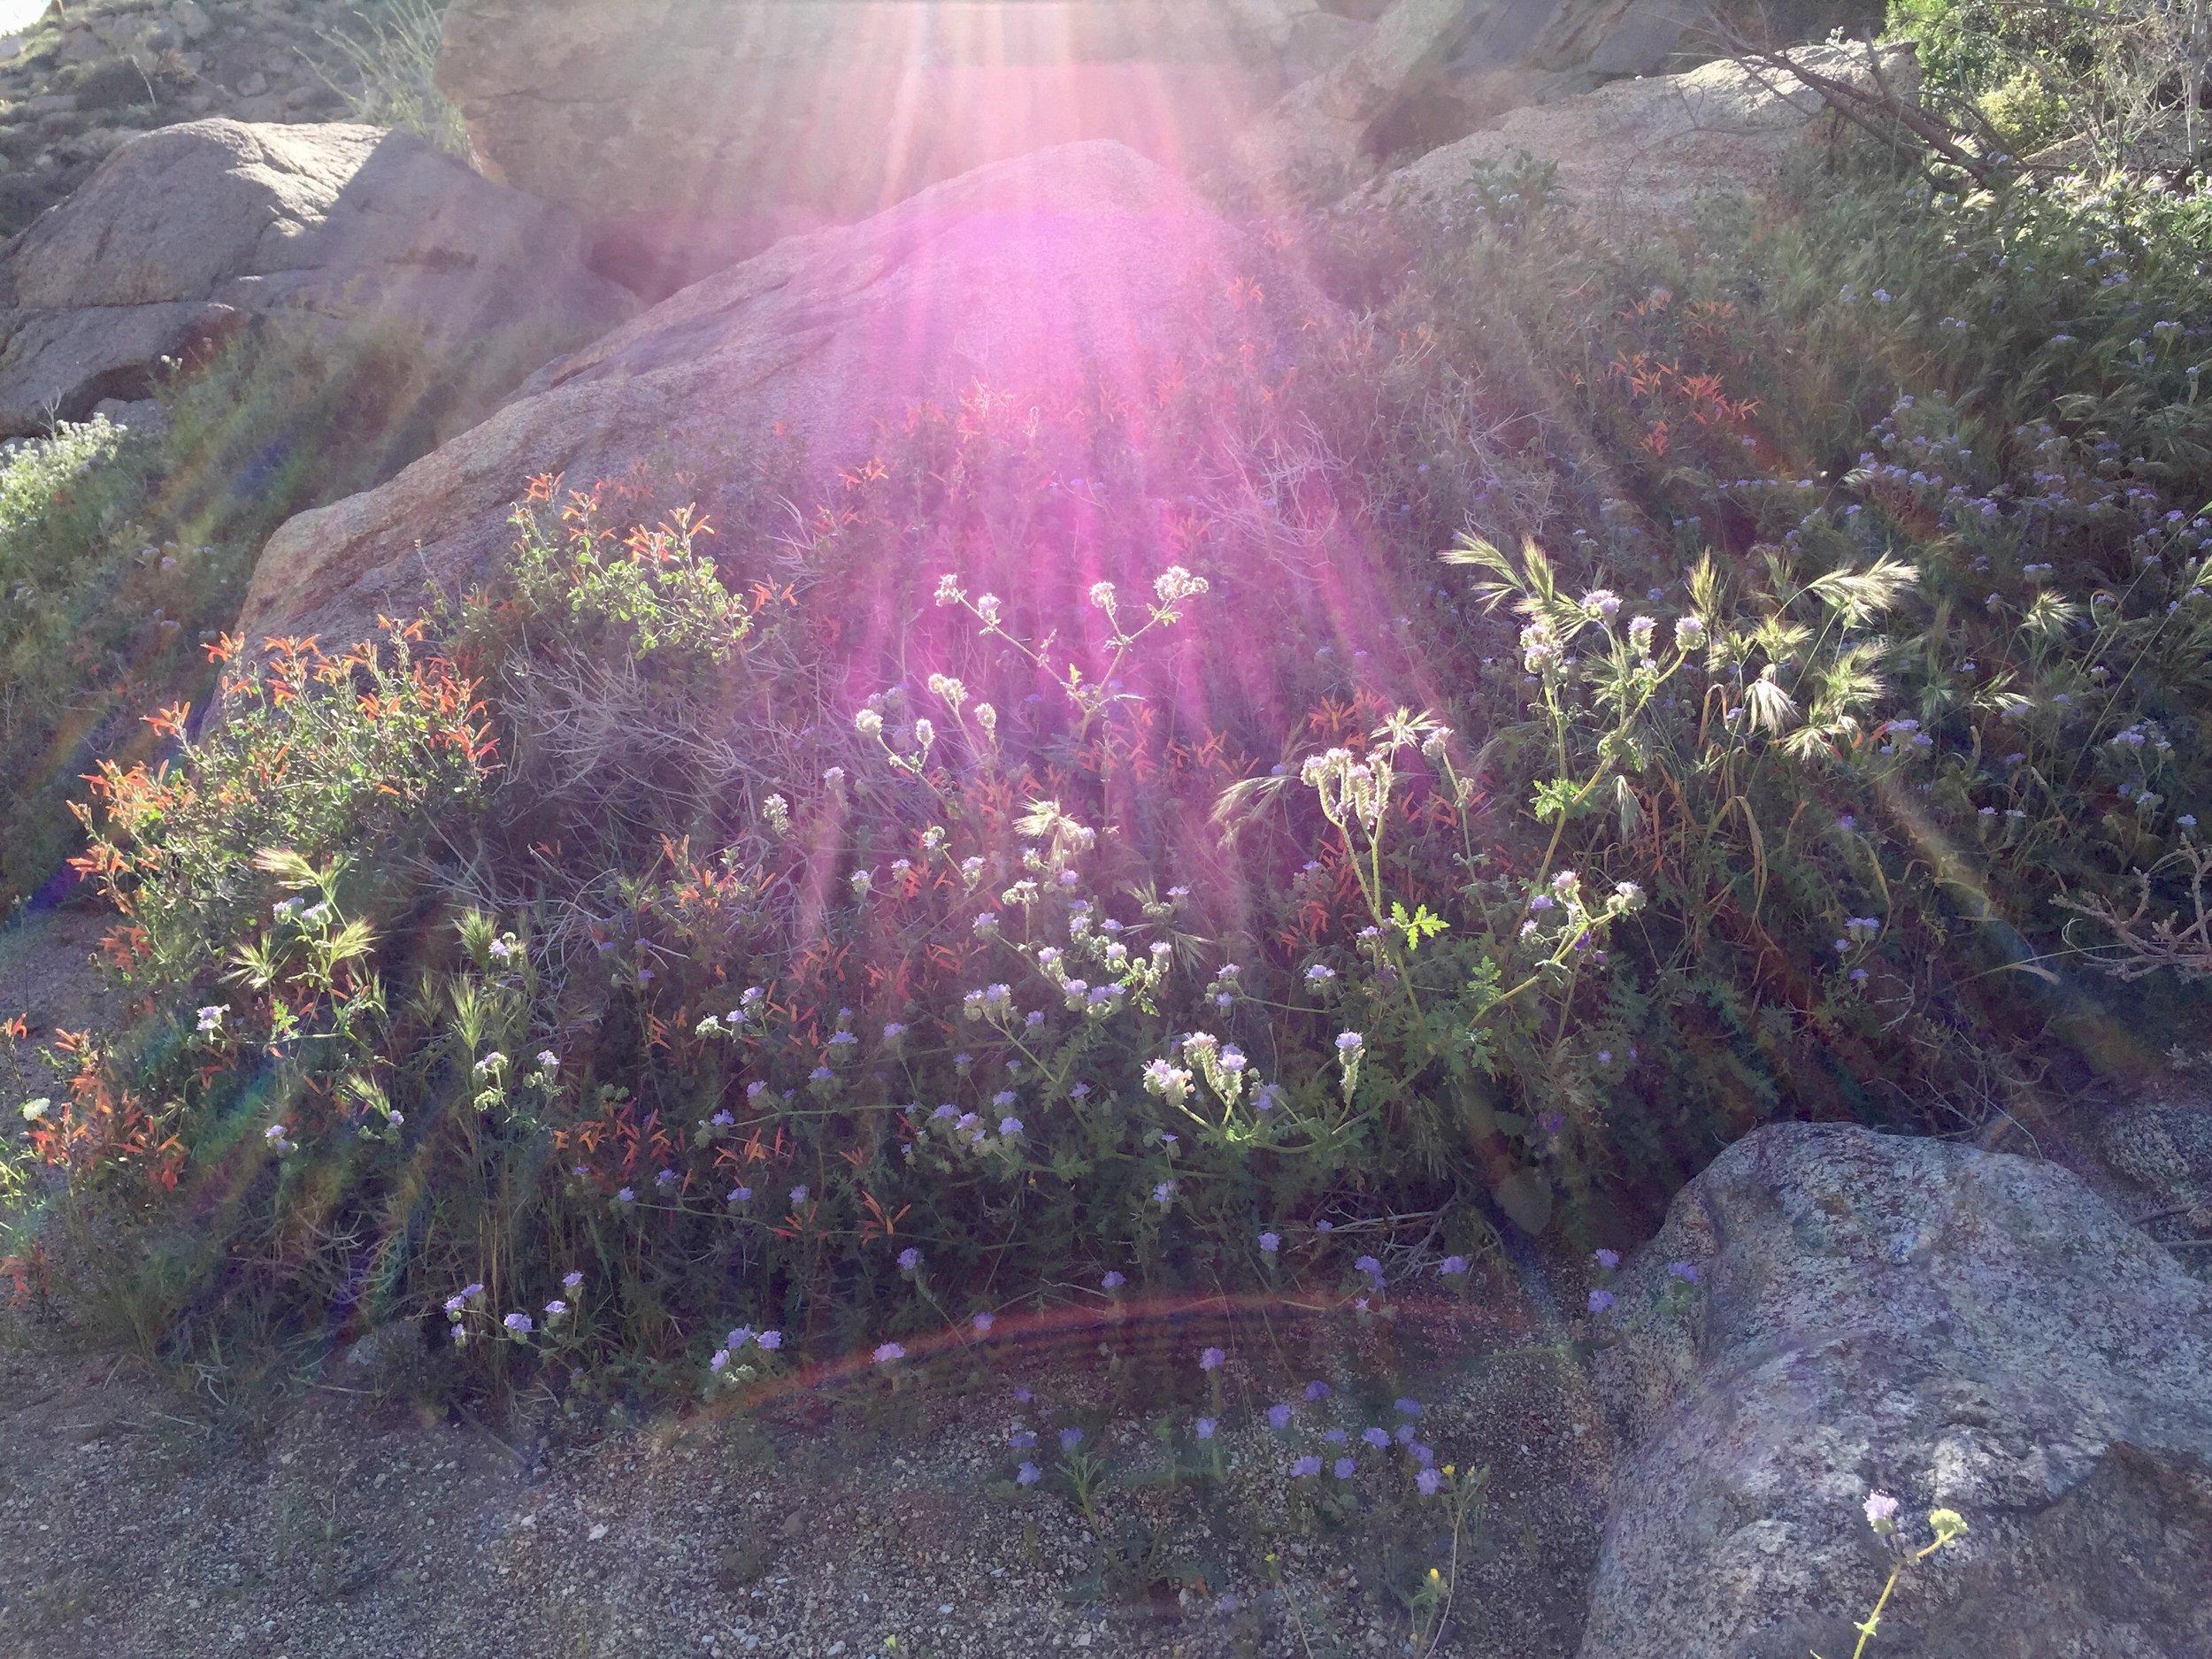 The sun shines in Anza Borrego State Park